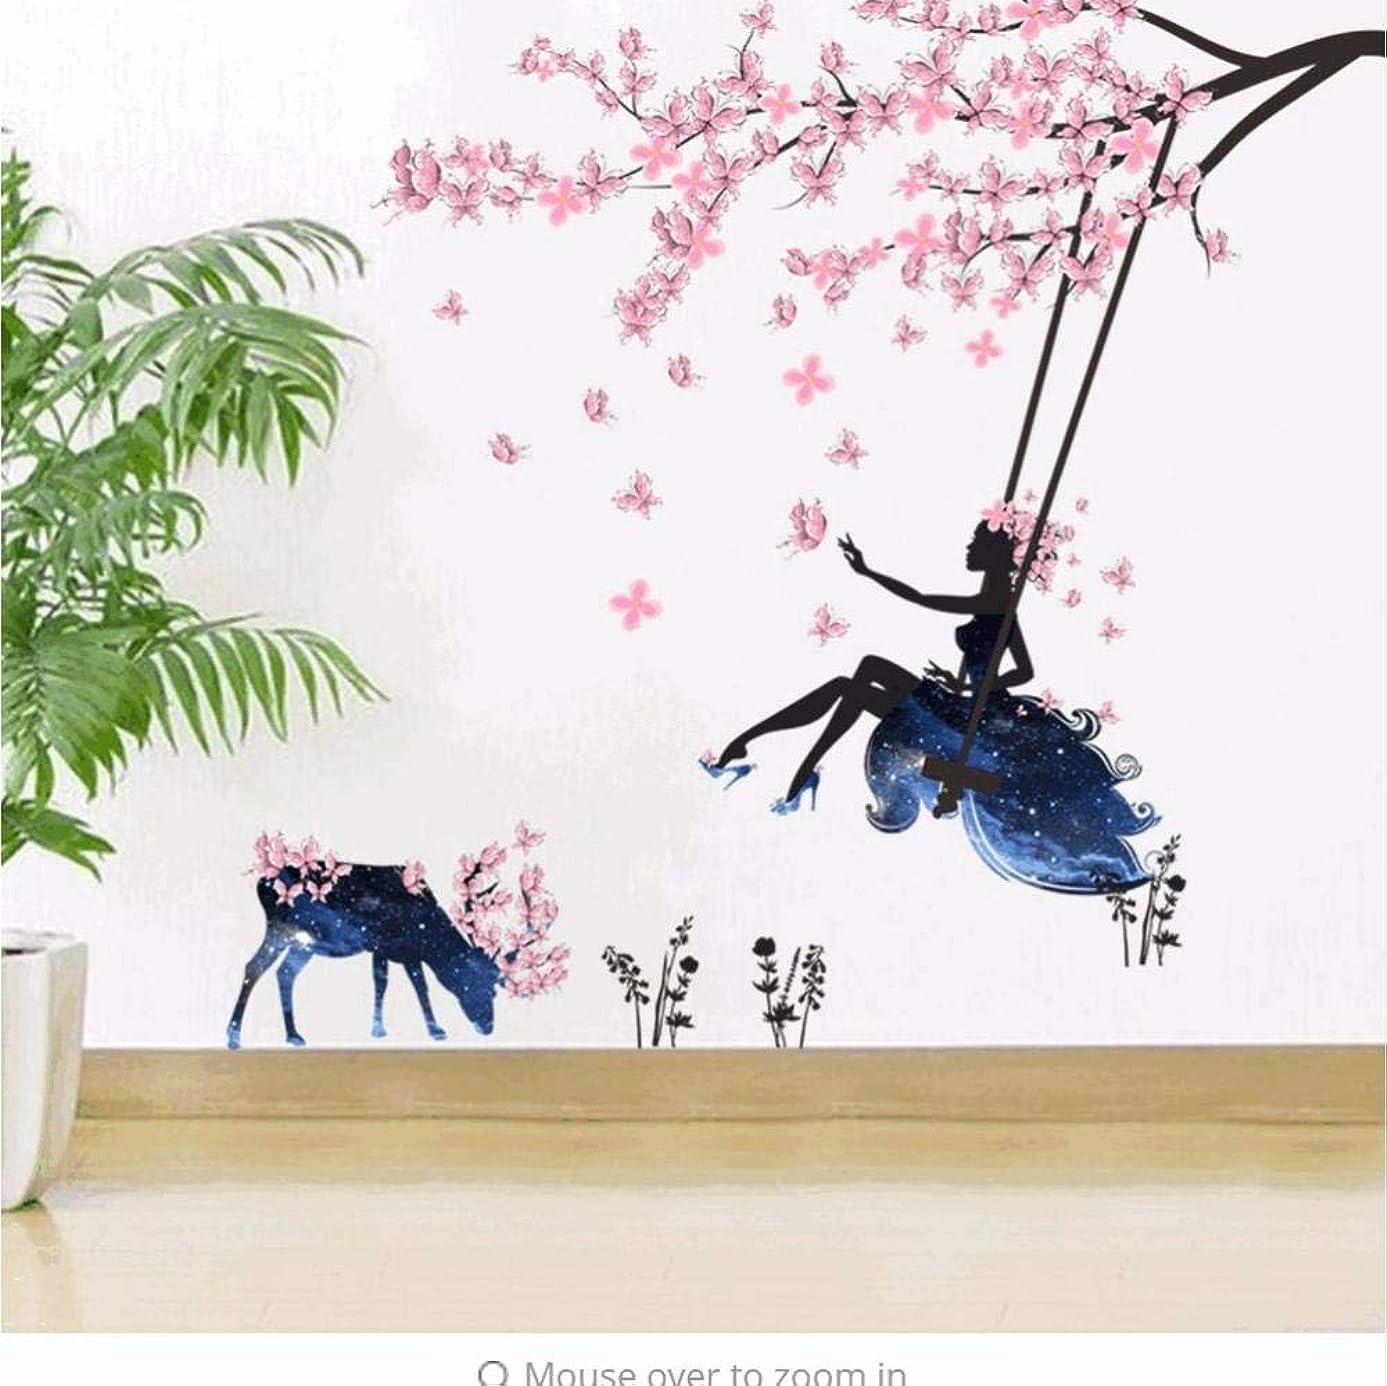 Scmkd Romantic Flower Fairy Swing Wall Stickers for Kids Room Wall Decor Bedroom Living Room Children Girls Room Decal Poster Mural